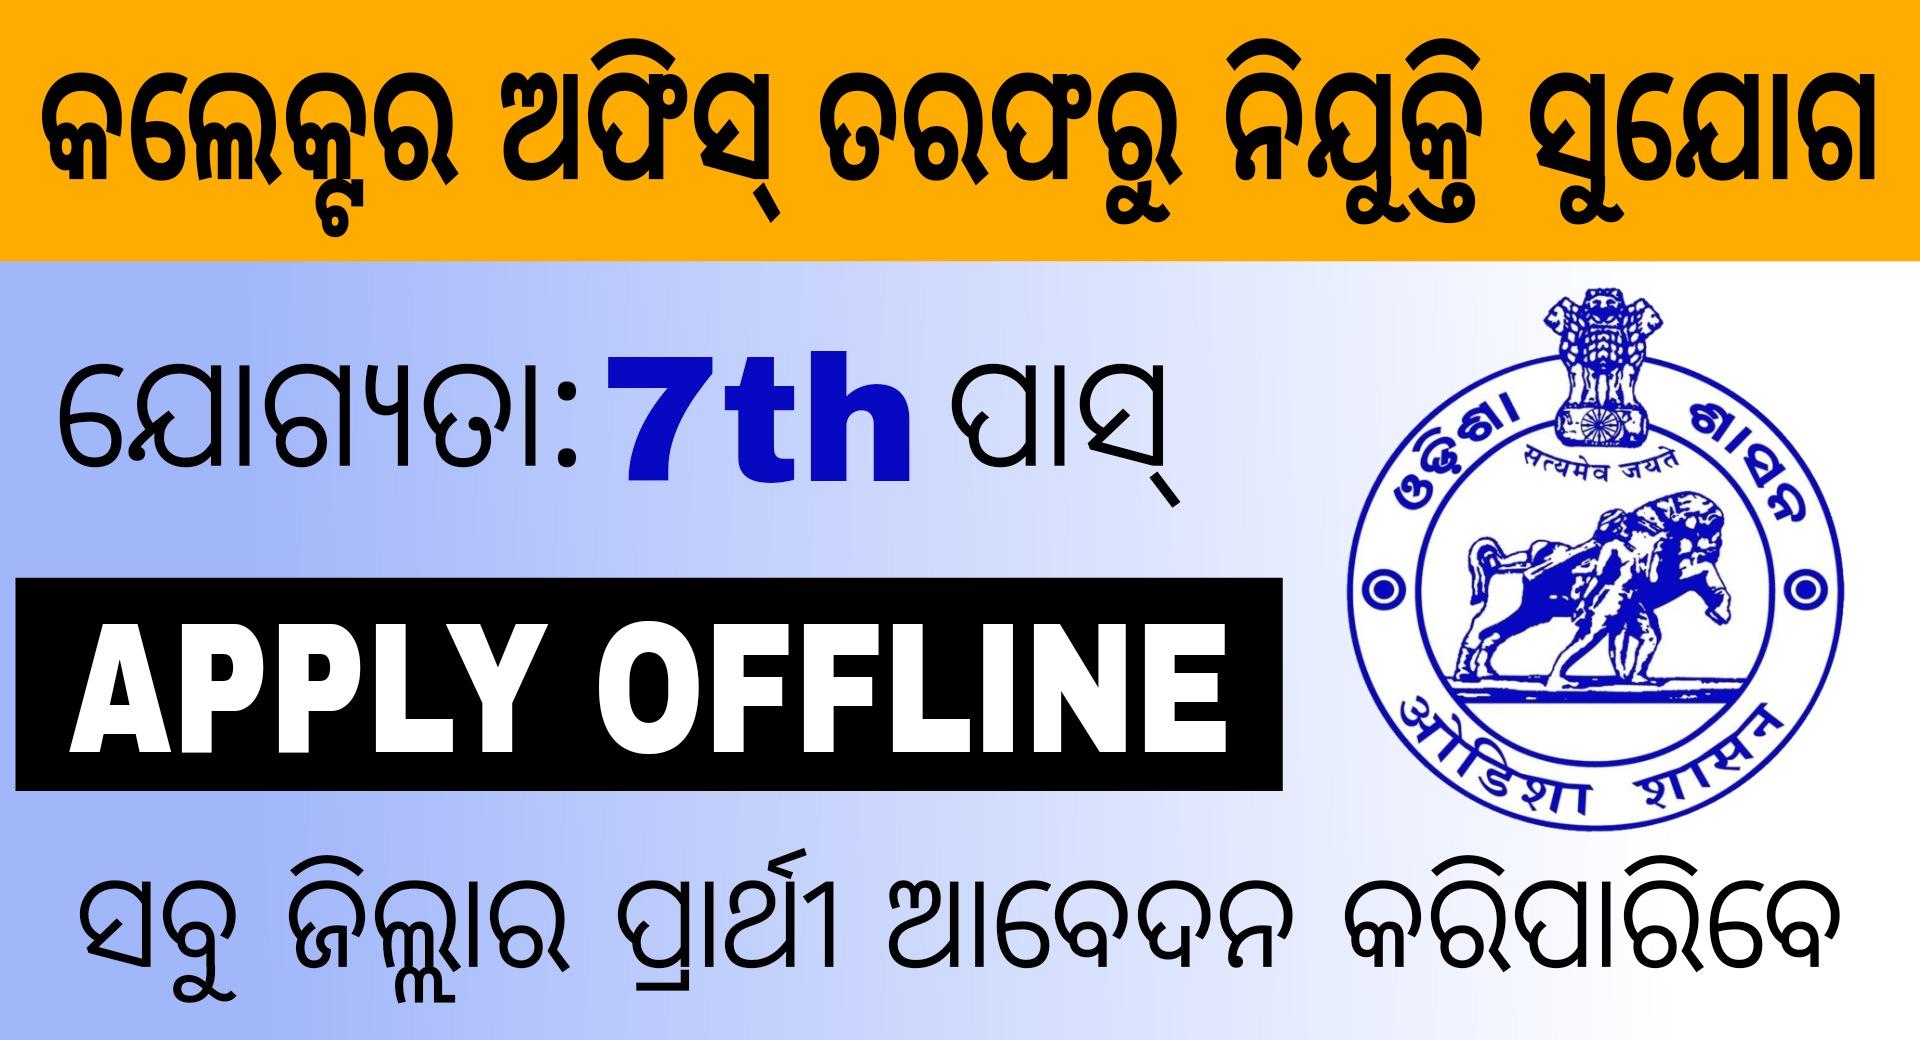 Jagatsinghpur District Collector Office Recruitment 2021 – Jobs in Odisha